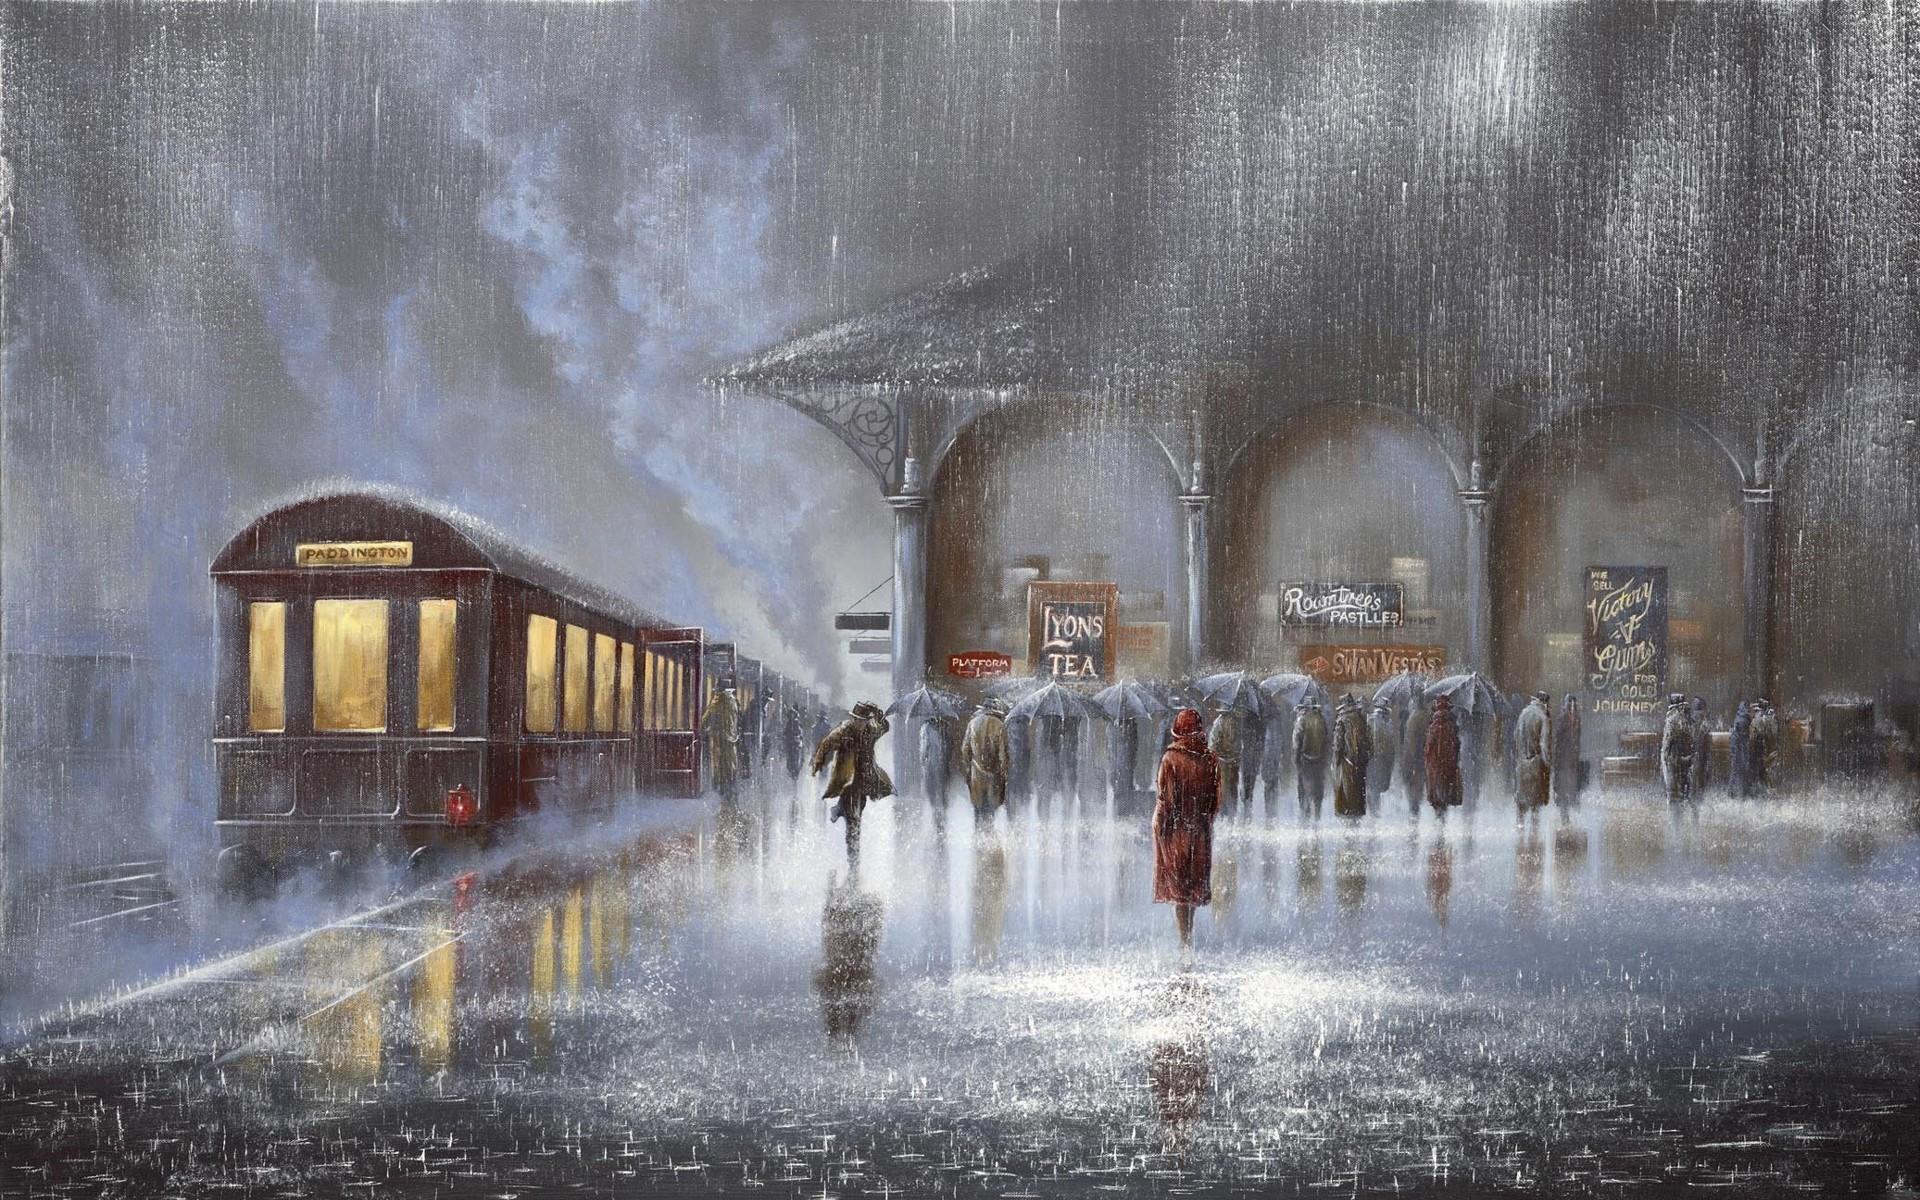 Rainy desktop wallpaper 64 images - Rainy hd wallpaper for pc ...